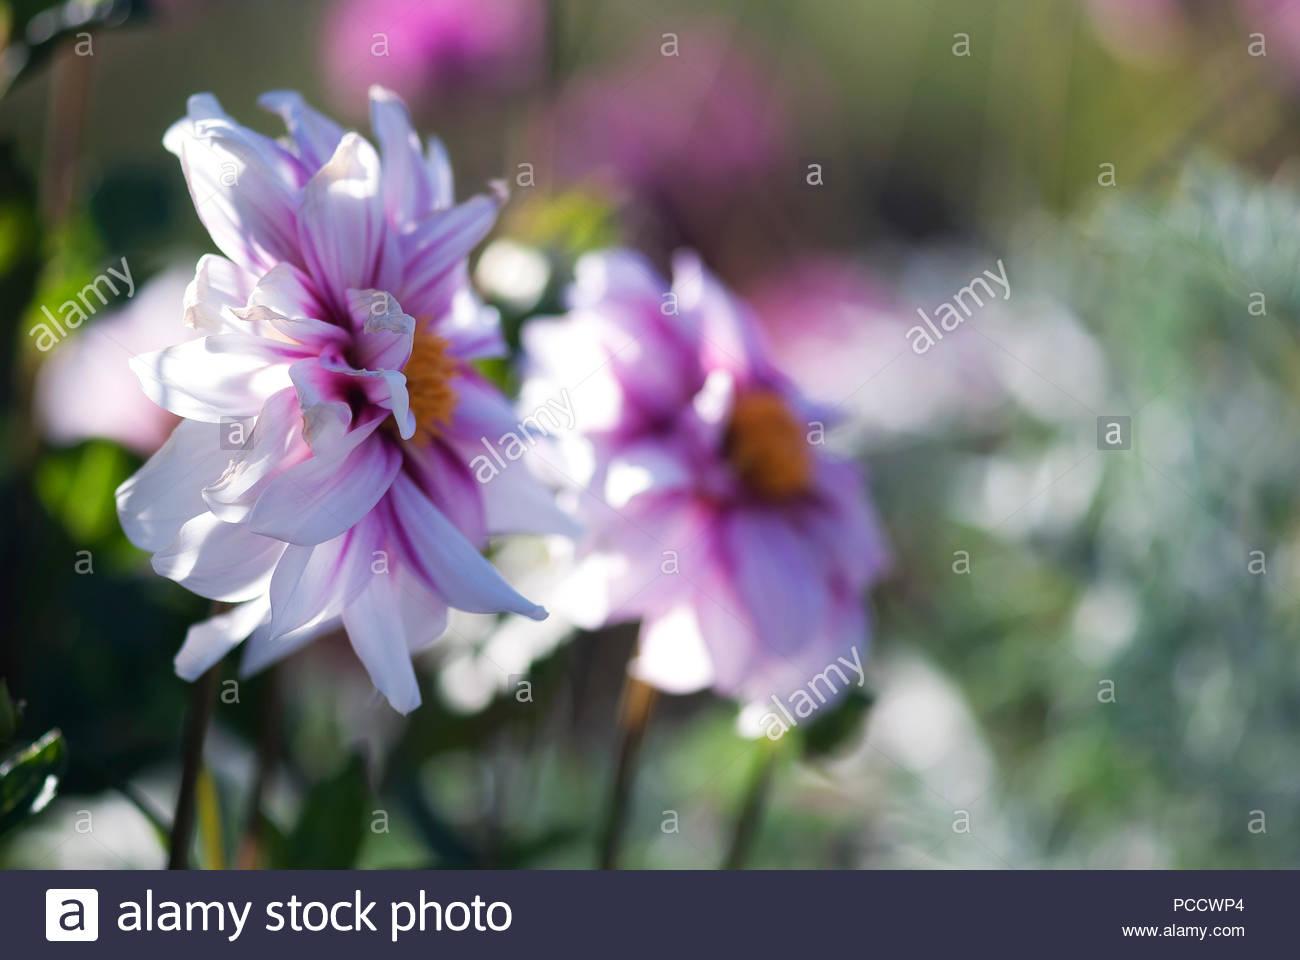 Delicate purple dahlia flowers bloom in summertime stock photo delicate purple dahlia flowers bloom in summertime izmirmasajfo